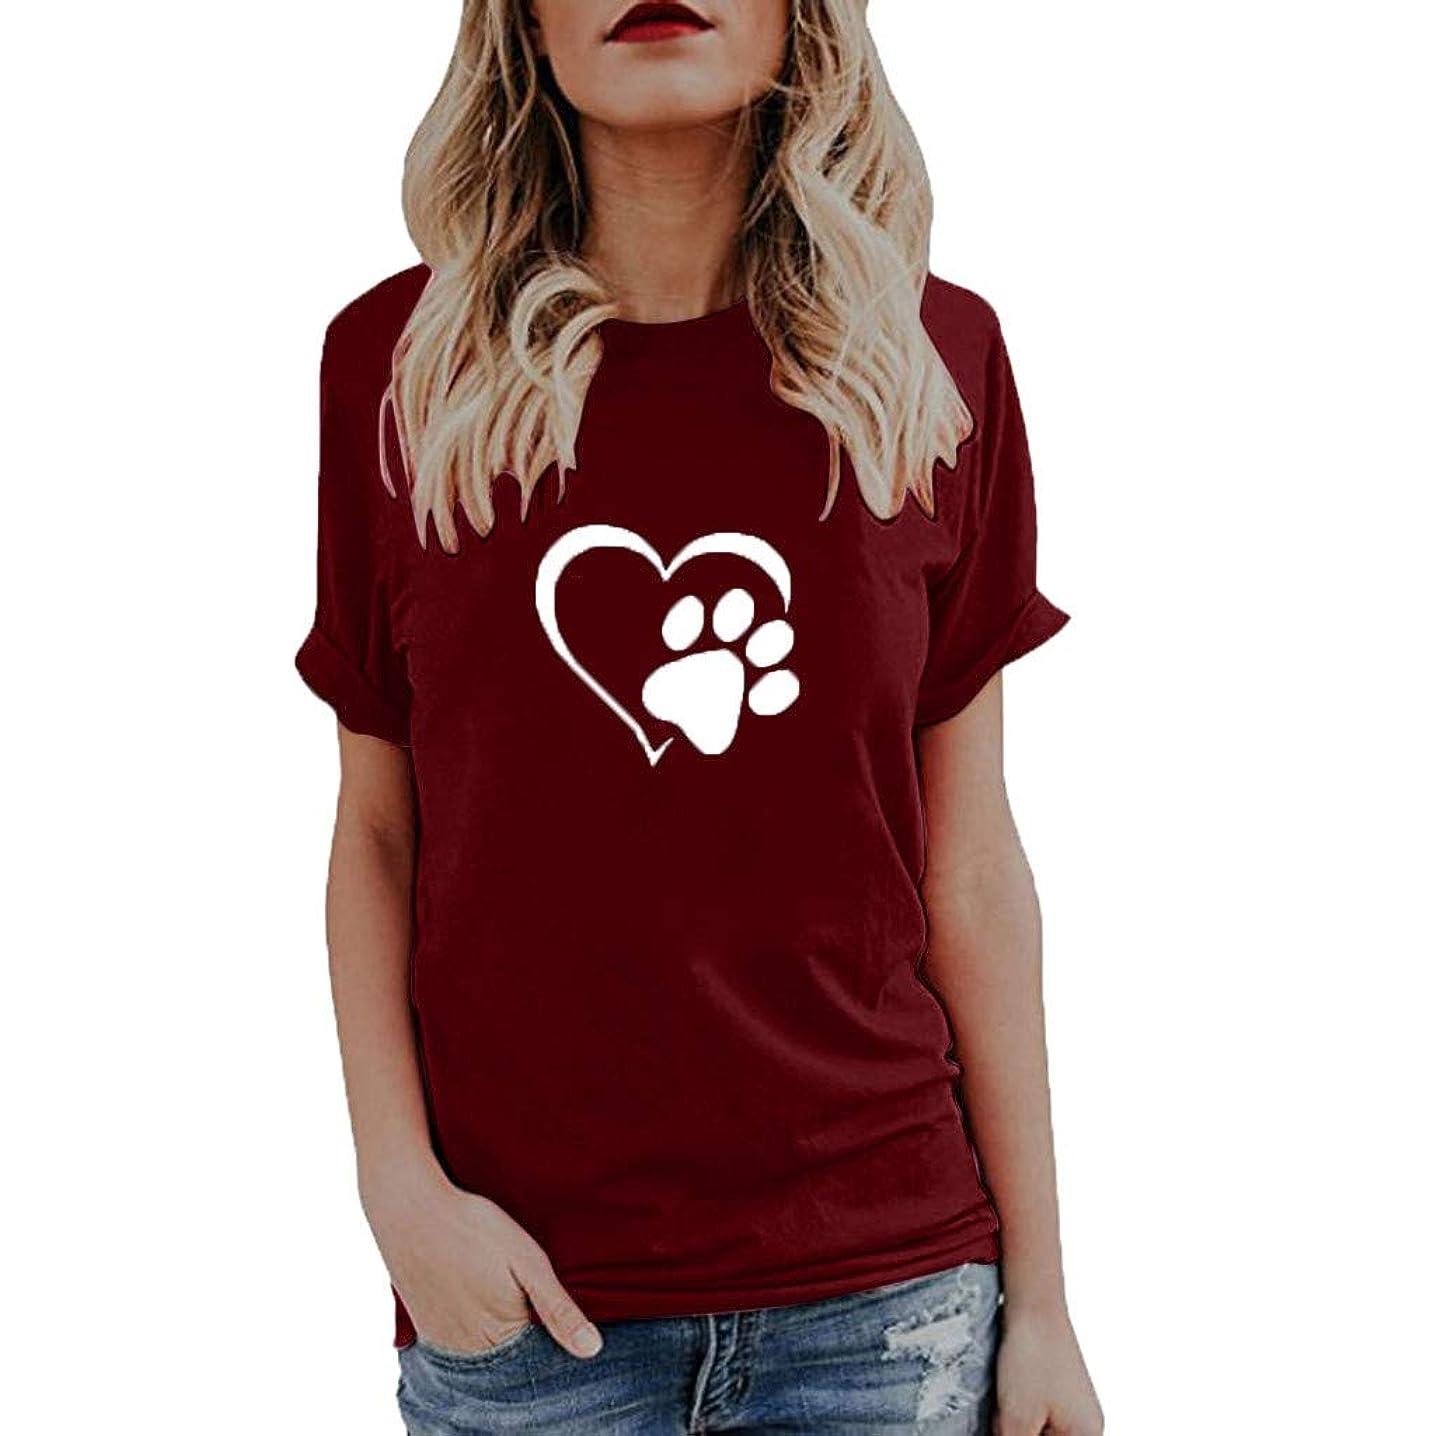 Women Basic T Shirt Summer Cute Print Short Sleeve Round Neck Loose Tunic Blouse Tops